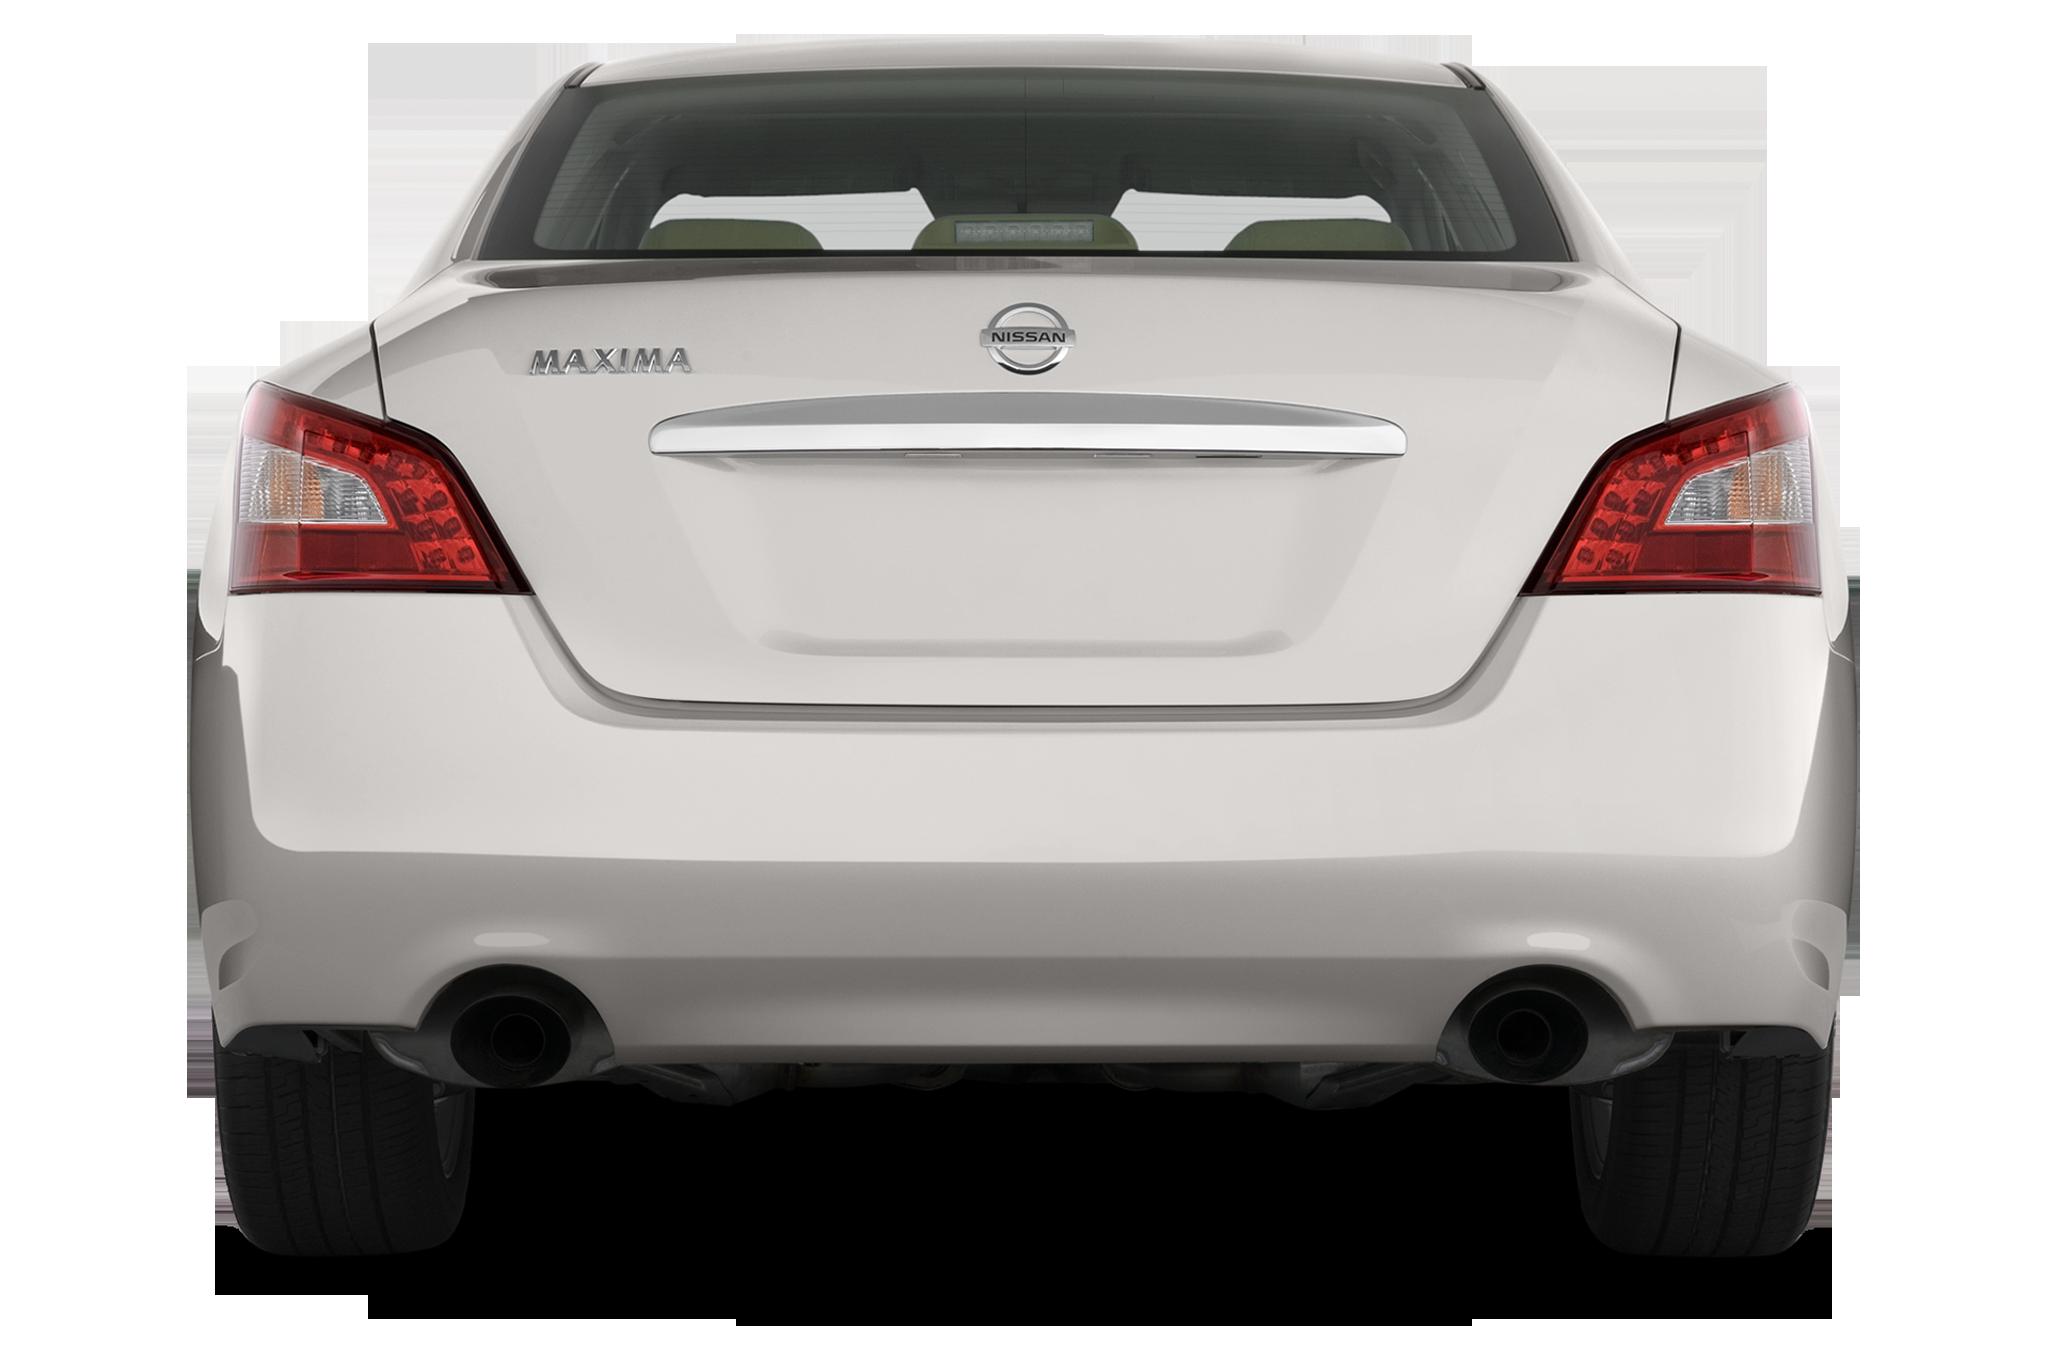 2010 Nissan Maxima 3.5 SV - Automobile Magazine